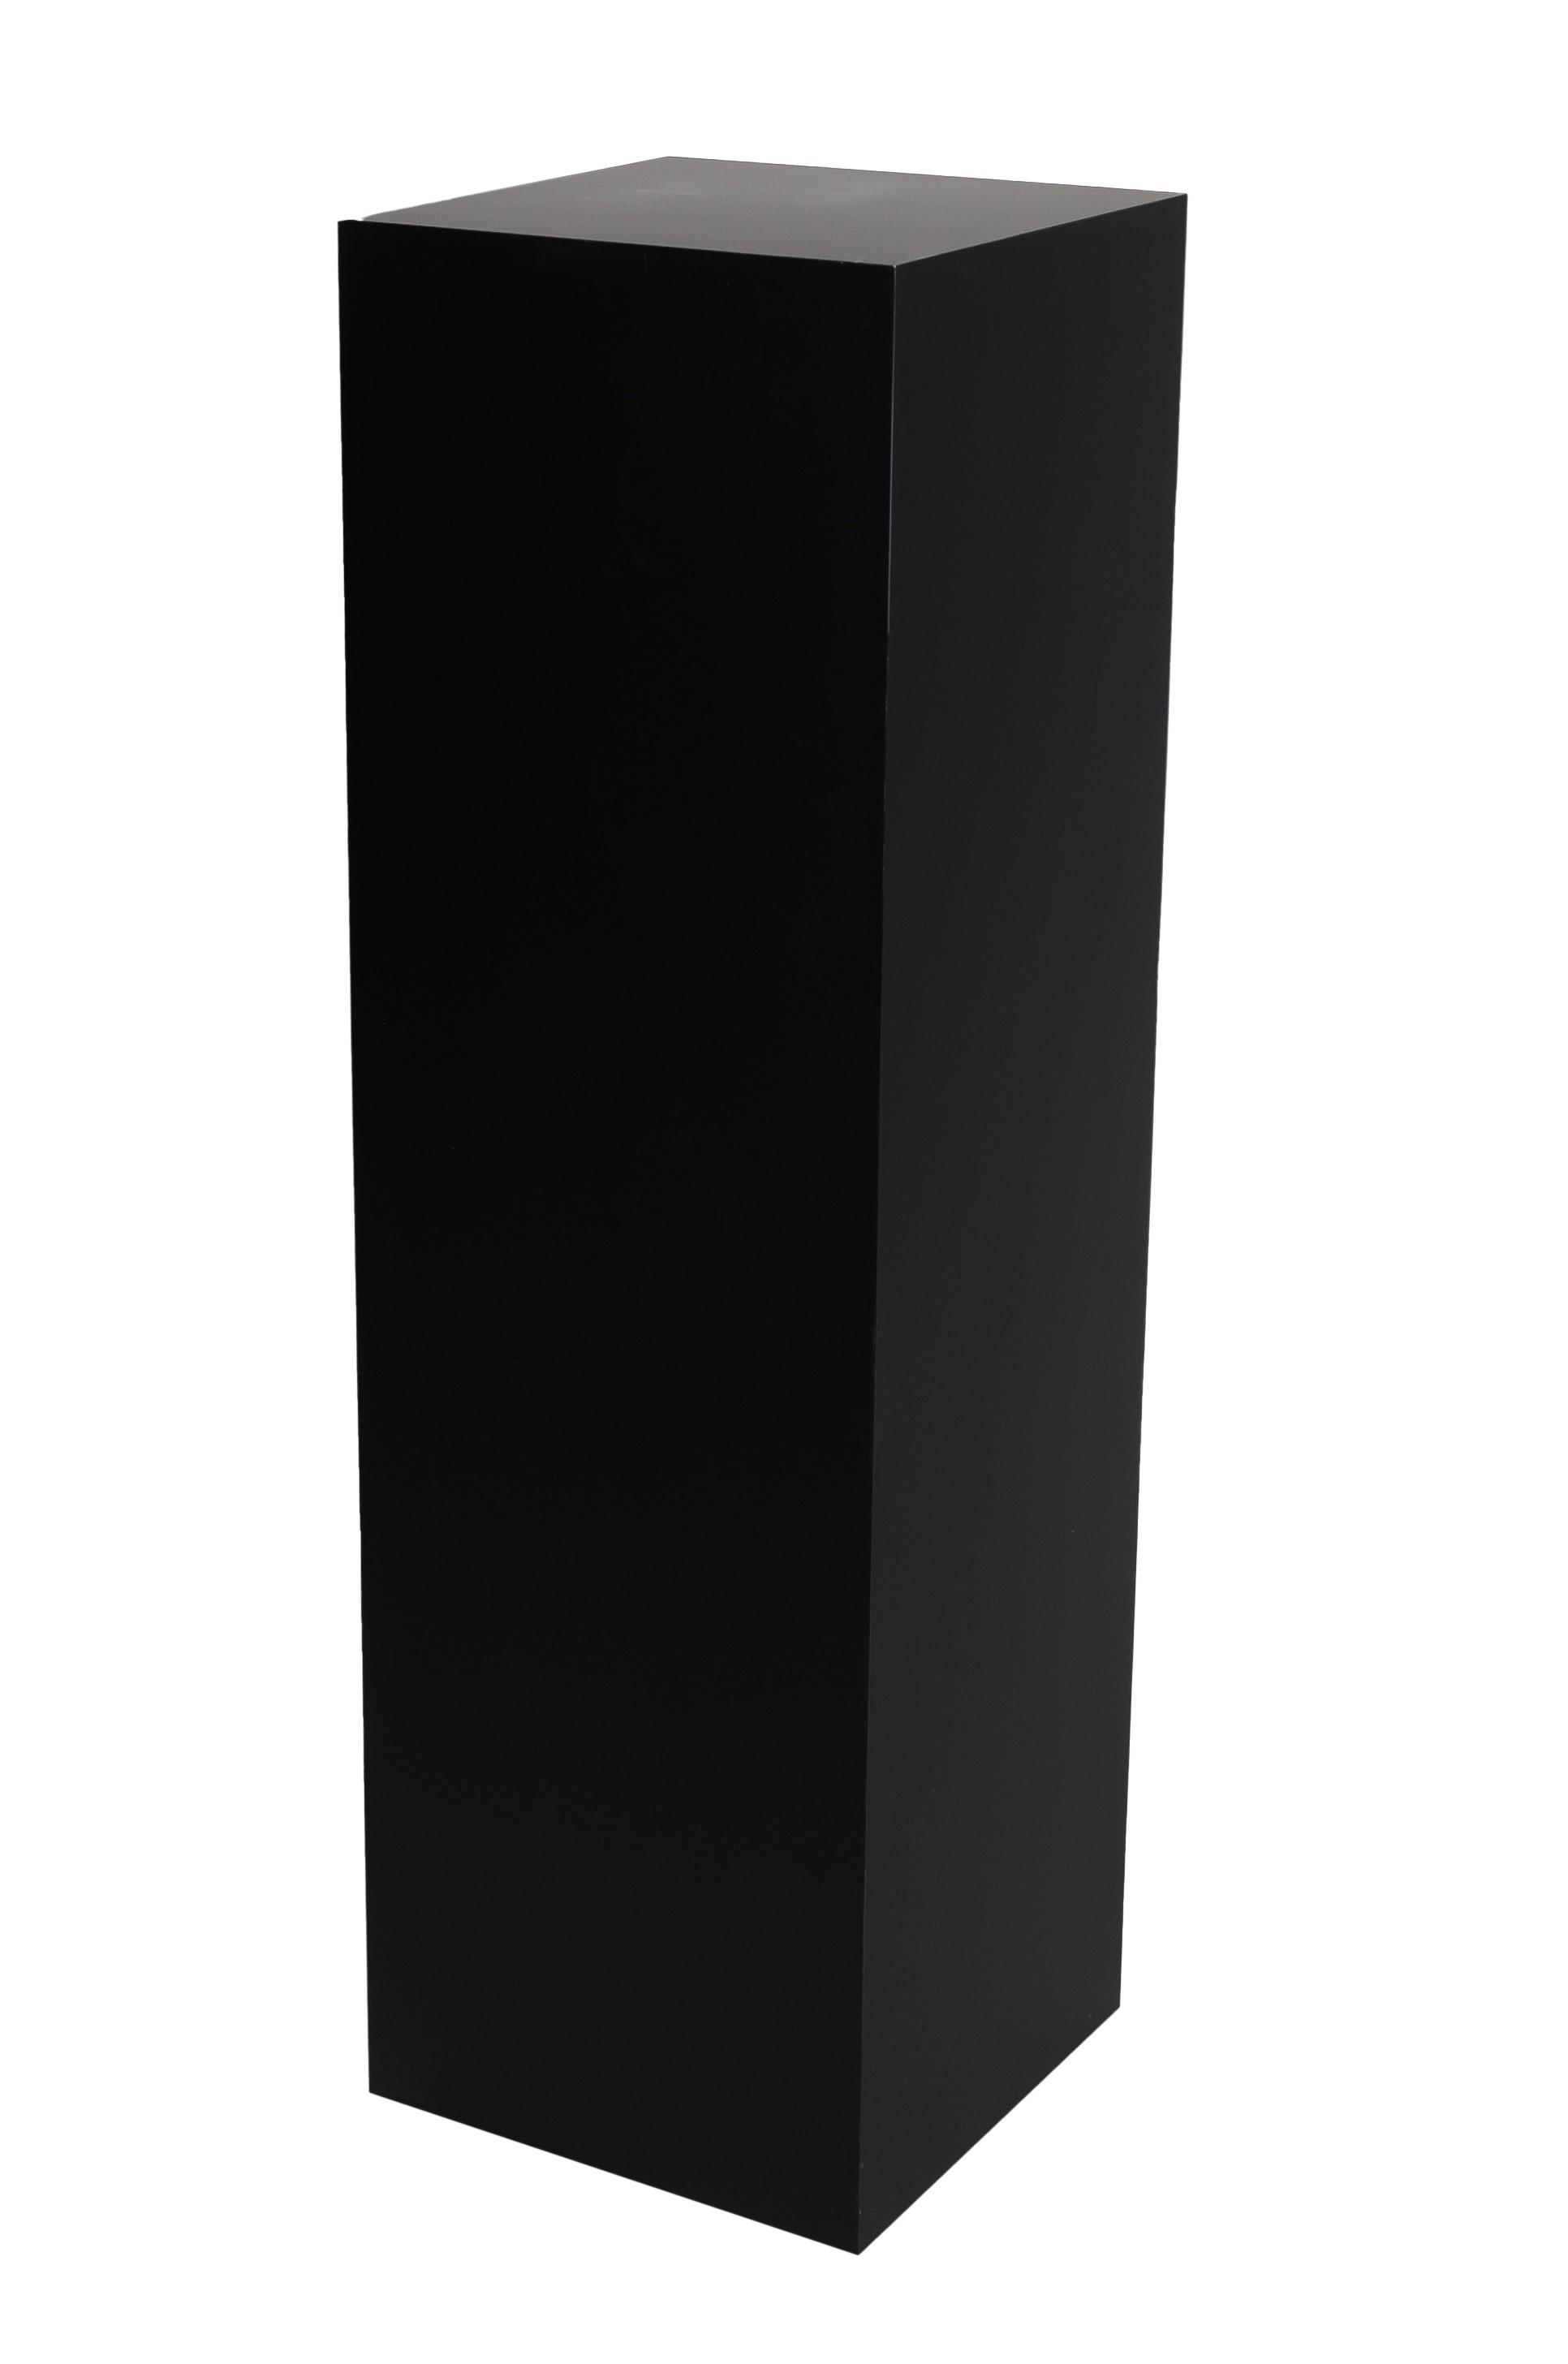 Galeriesockel schwarz matt